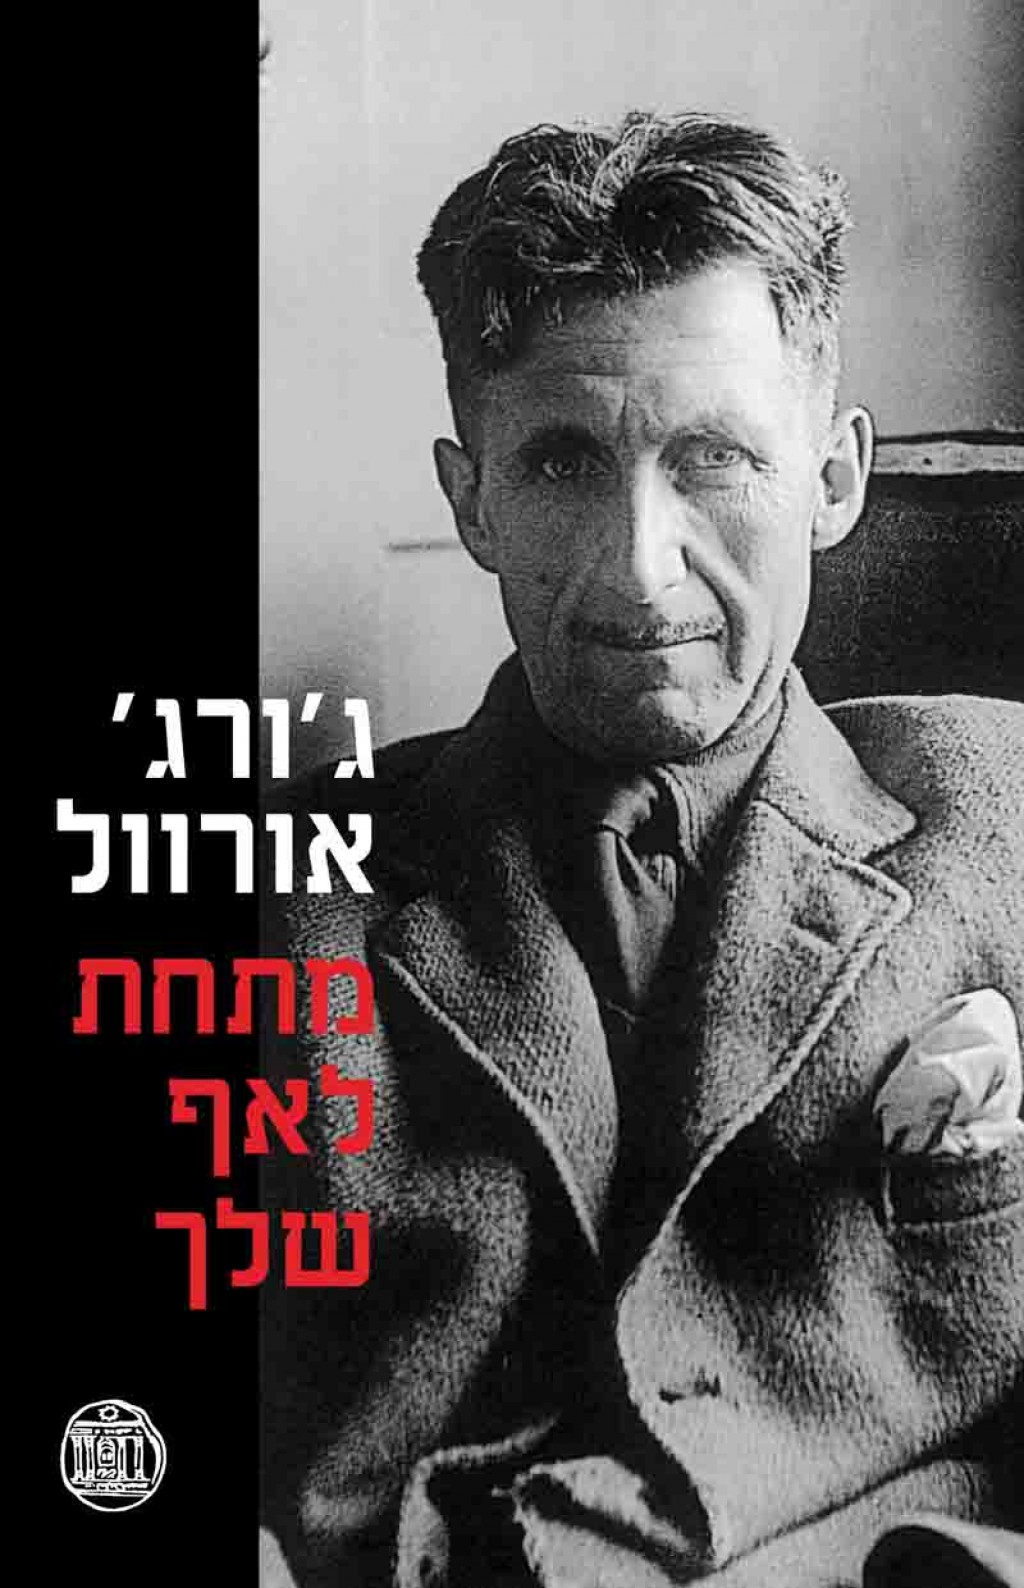 016 Mitahat Laaf Front George Orwell Essays Essay Frightening Everyman's Library Summary Bookshop Memories Large